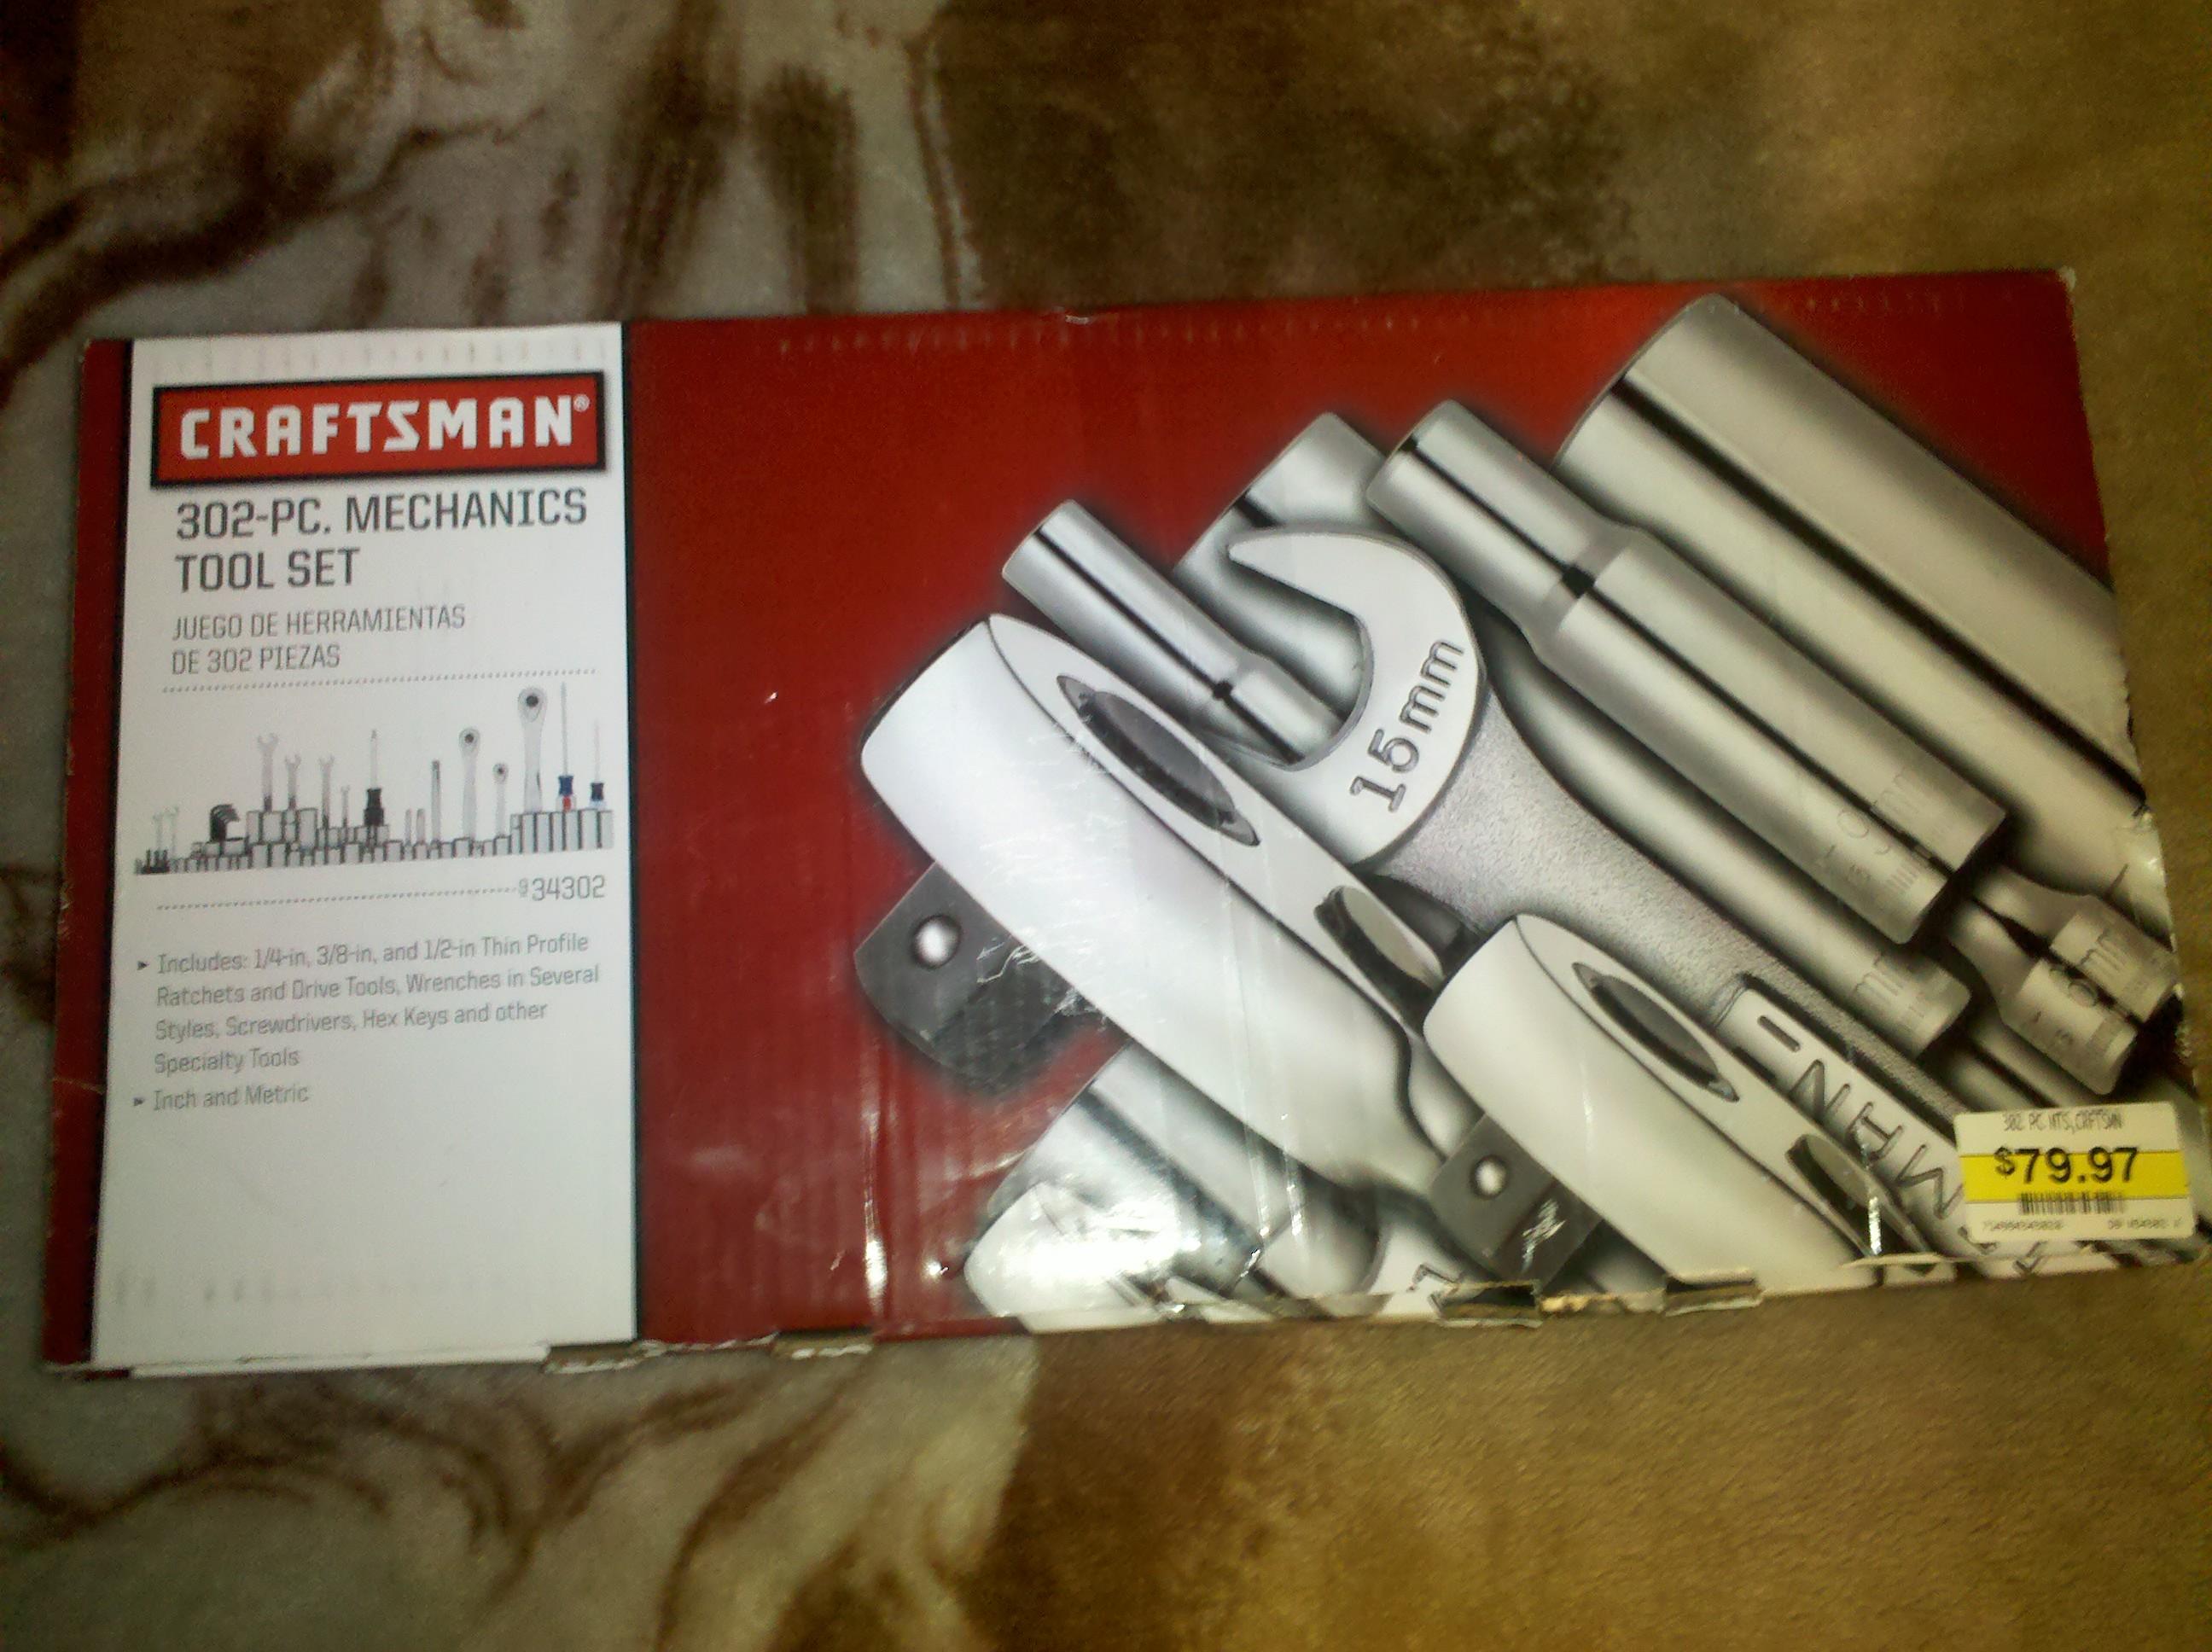 Clearance: Sears Craftsman 302 pc. Mechanics Tool Set $79.97 Regular $399.99 B&M